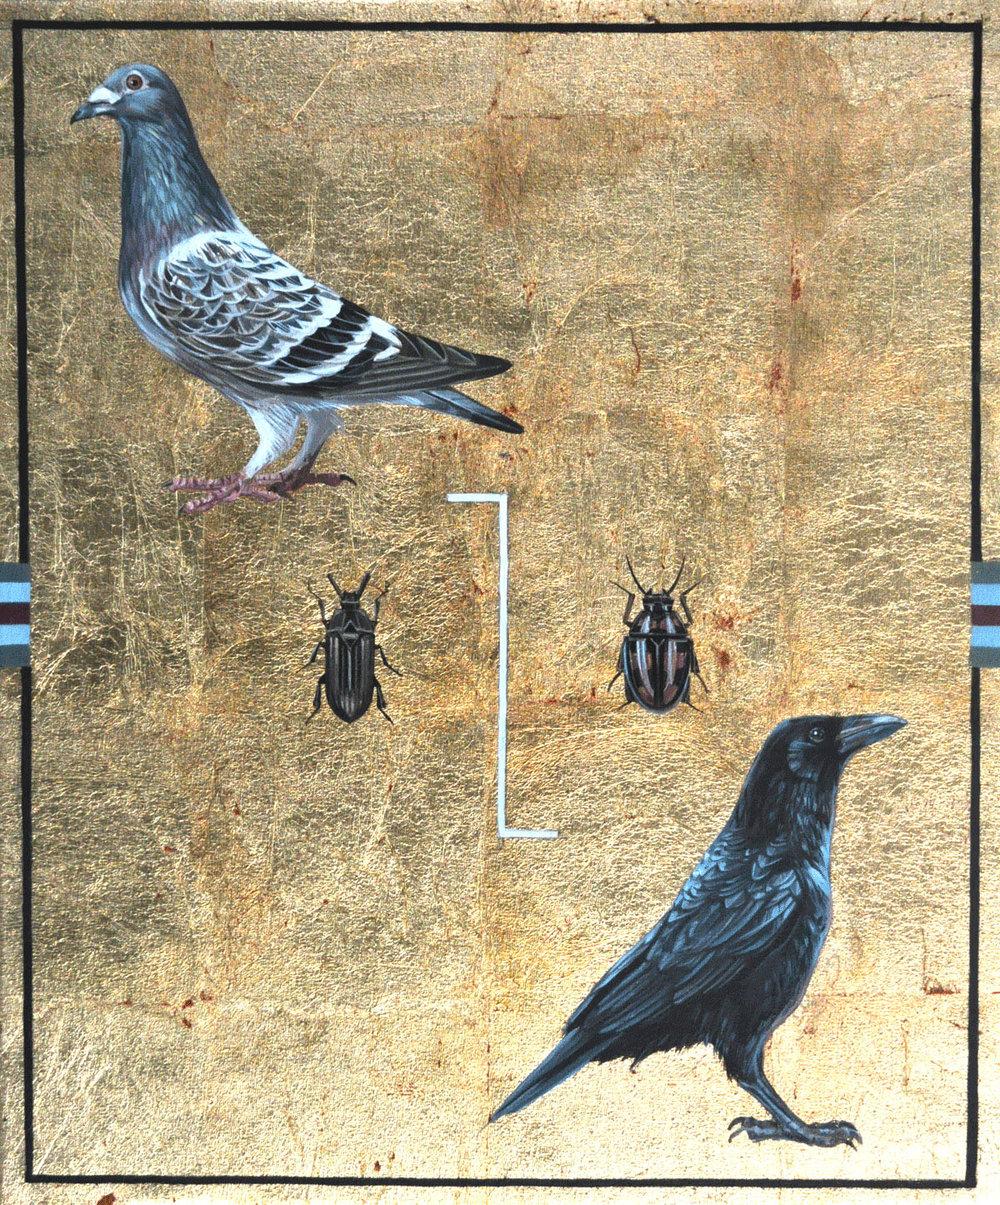 """NIMENOS"" (detalle), 2017. Óleo, esmalte y pan de oro sobre lienzo. 46x55 cm."